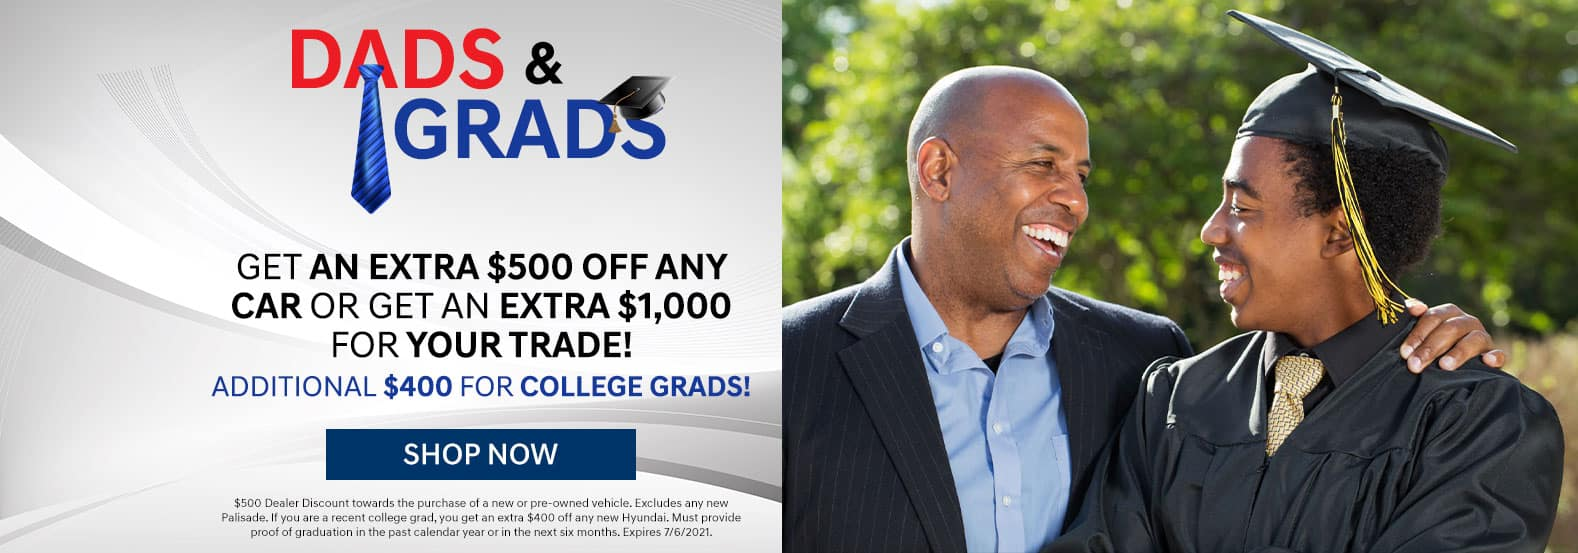 Special Offer for Dads & Grads June 2021